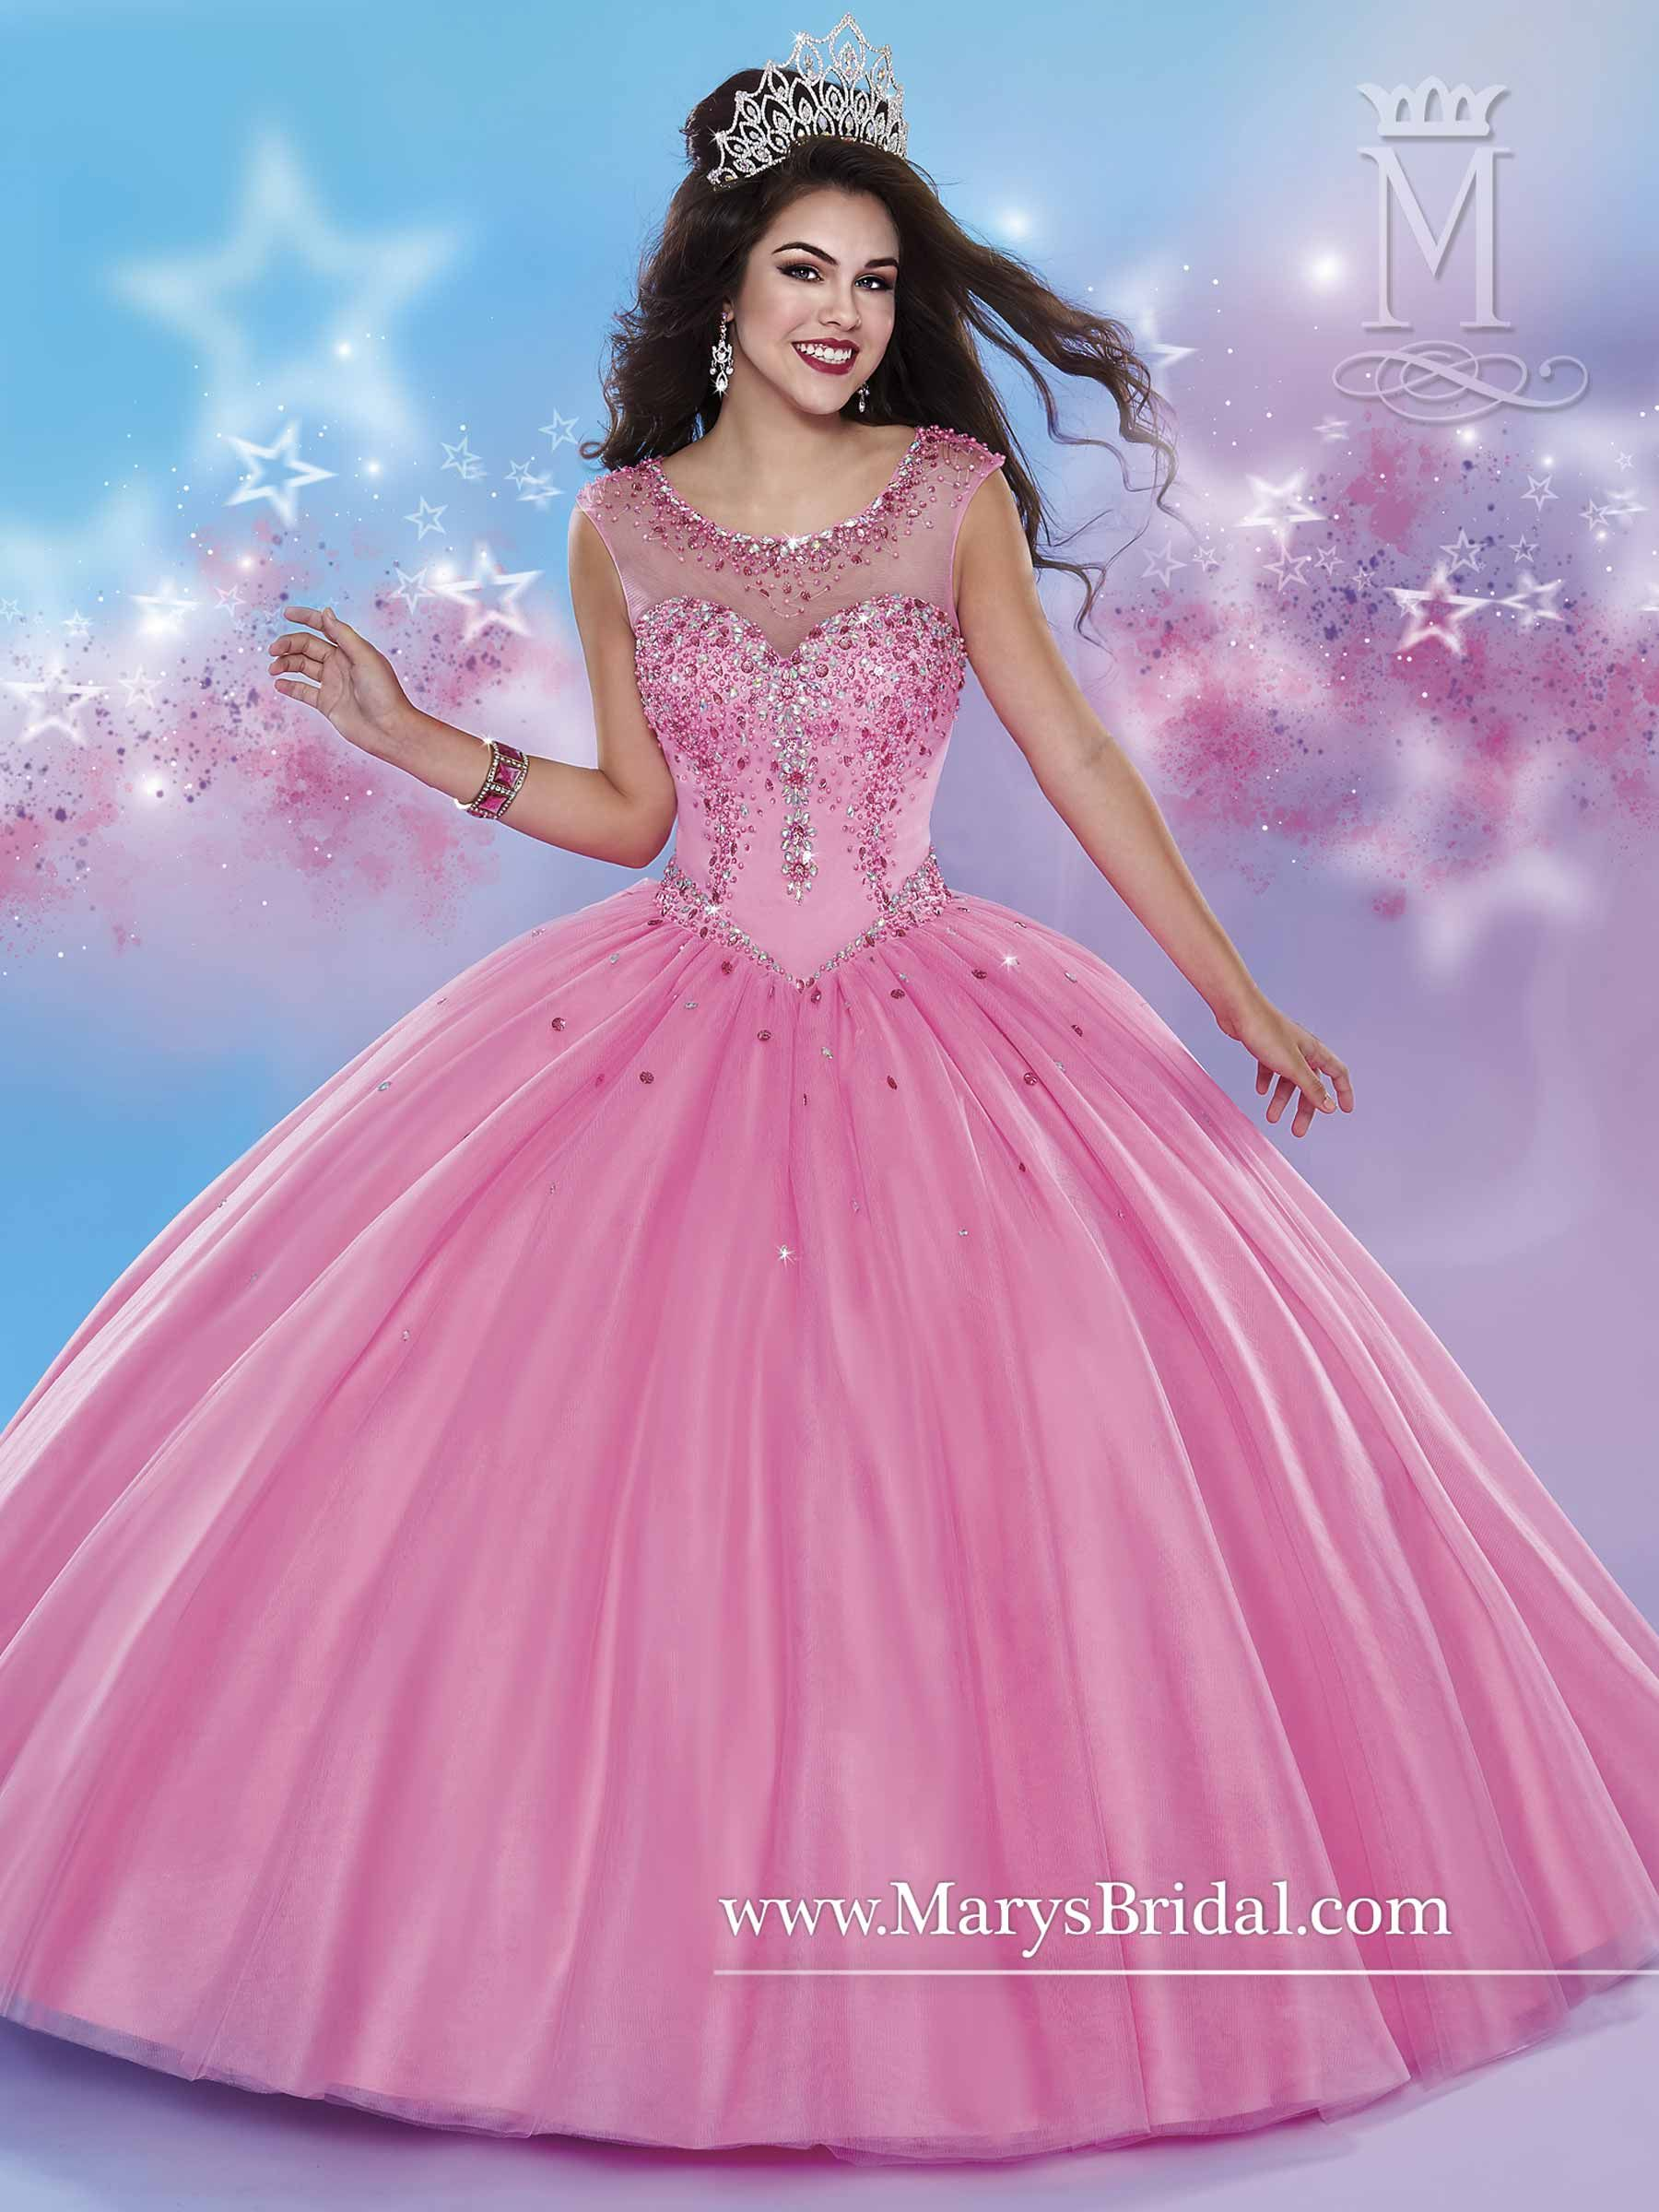 Mary\'s style ID 4657 | A Ball erina | Pinterest | Vestido de quince ...